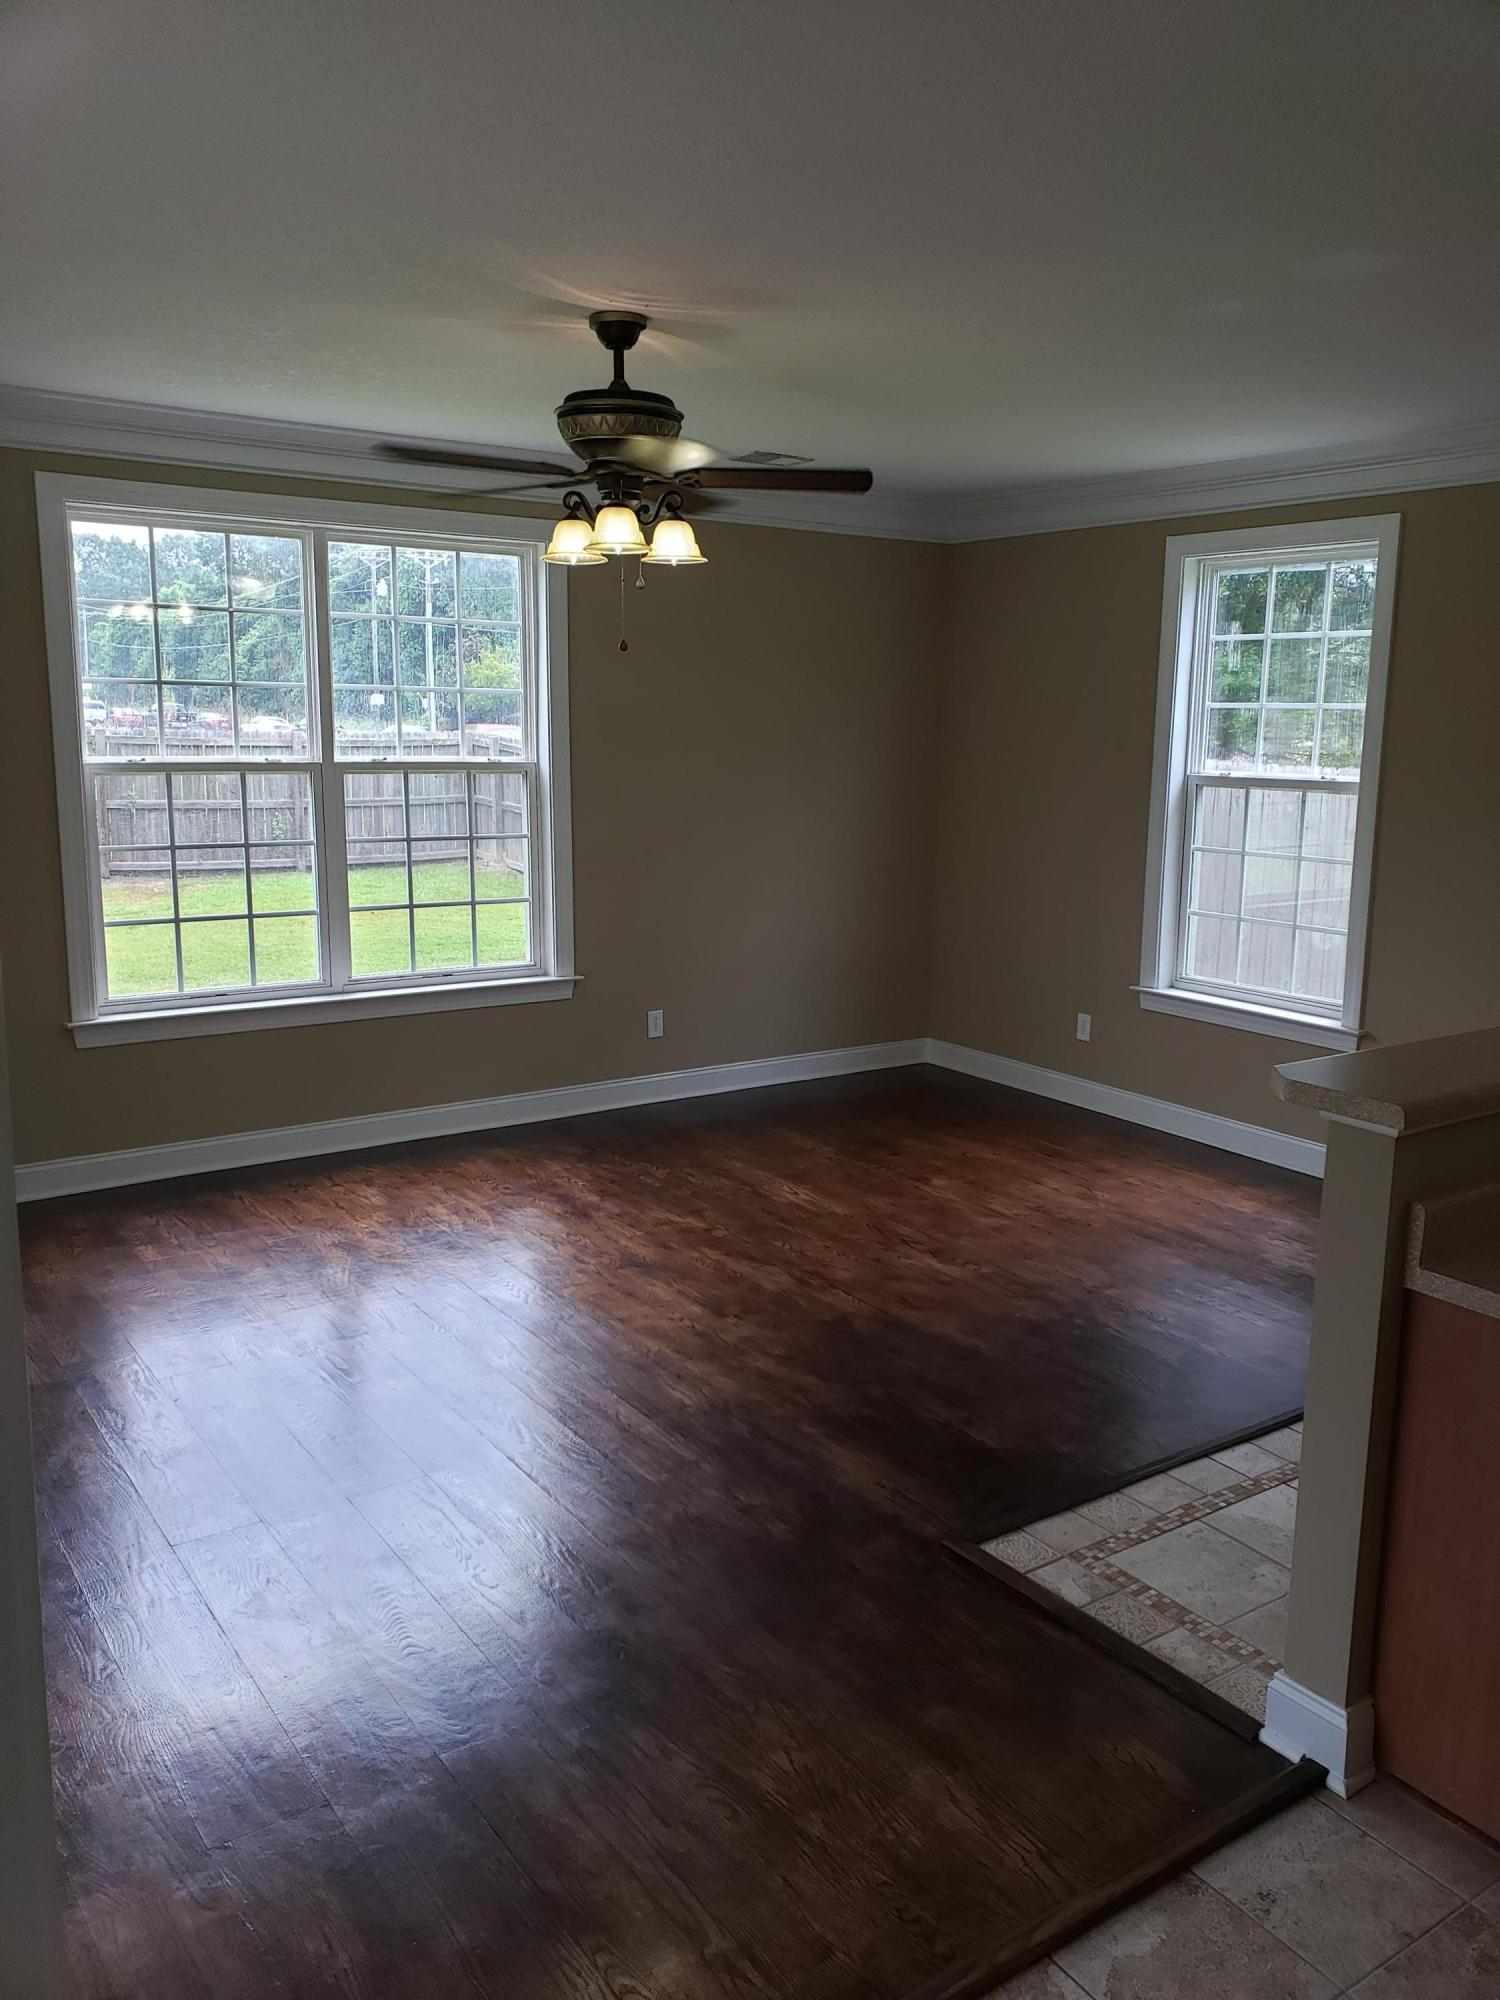 Montague Pointe Homes For Sale - 100 Gavins, Goose Creek, SC - 17